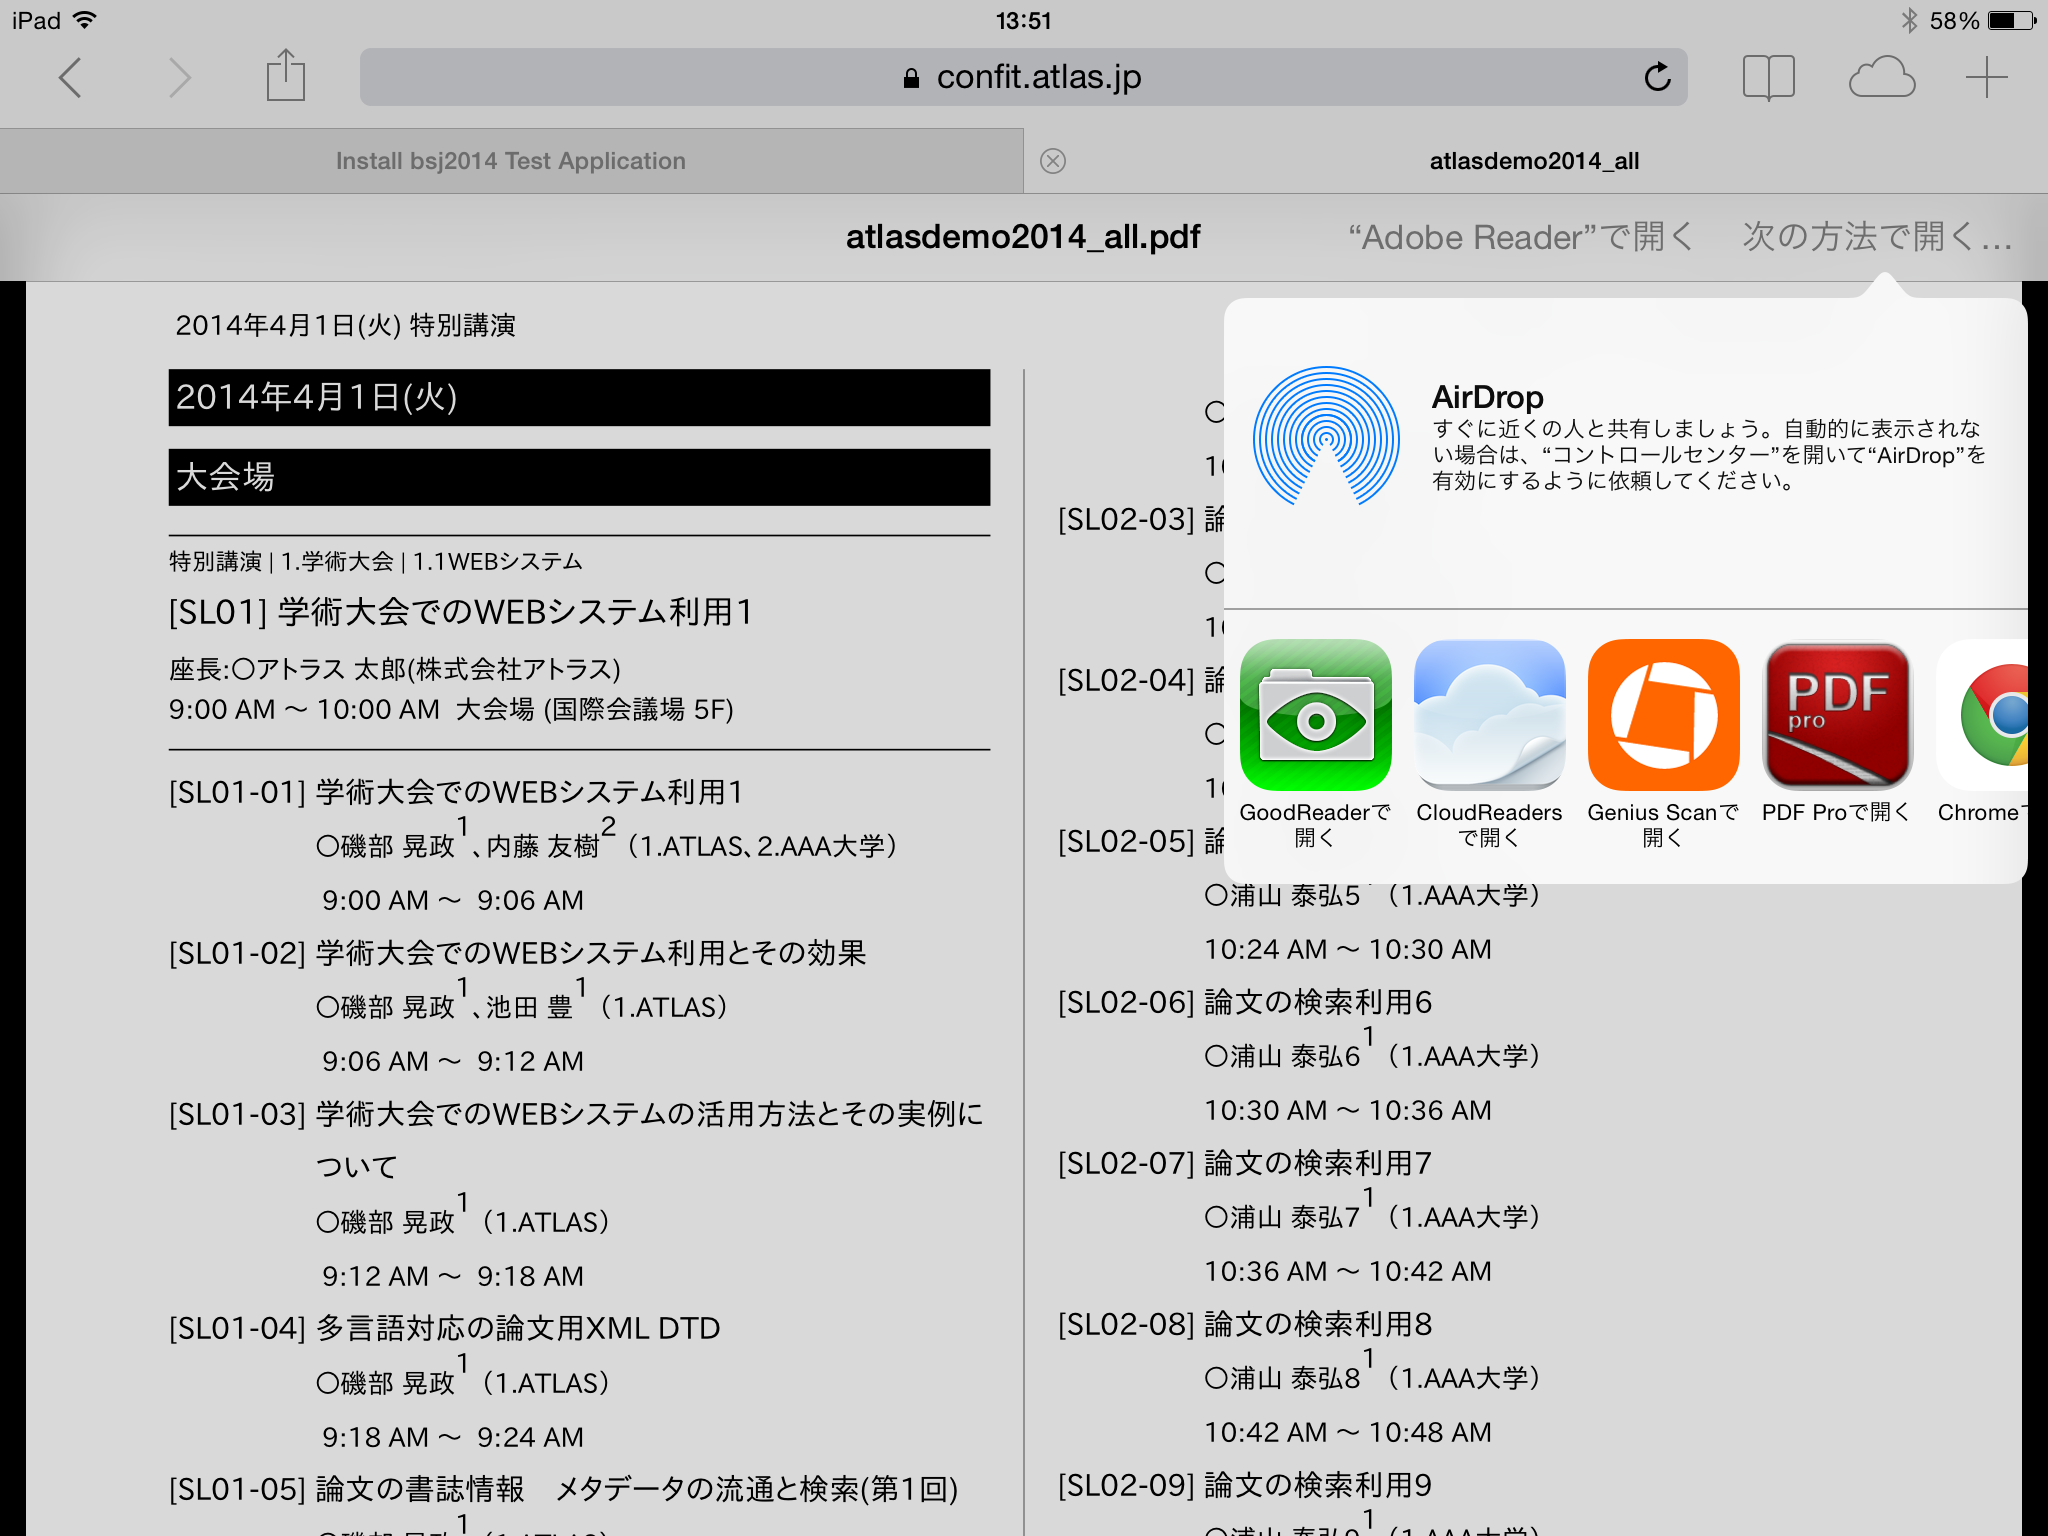 iPadのSafariでPDFを開くと